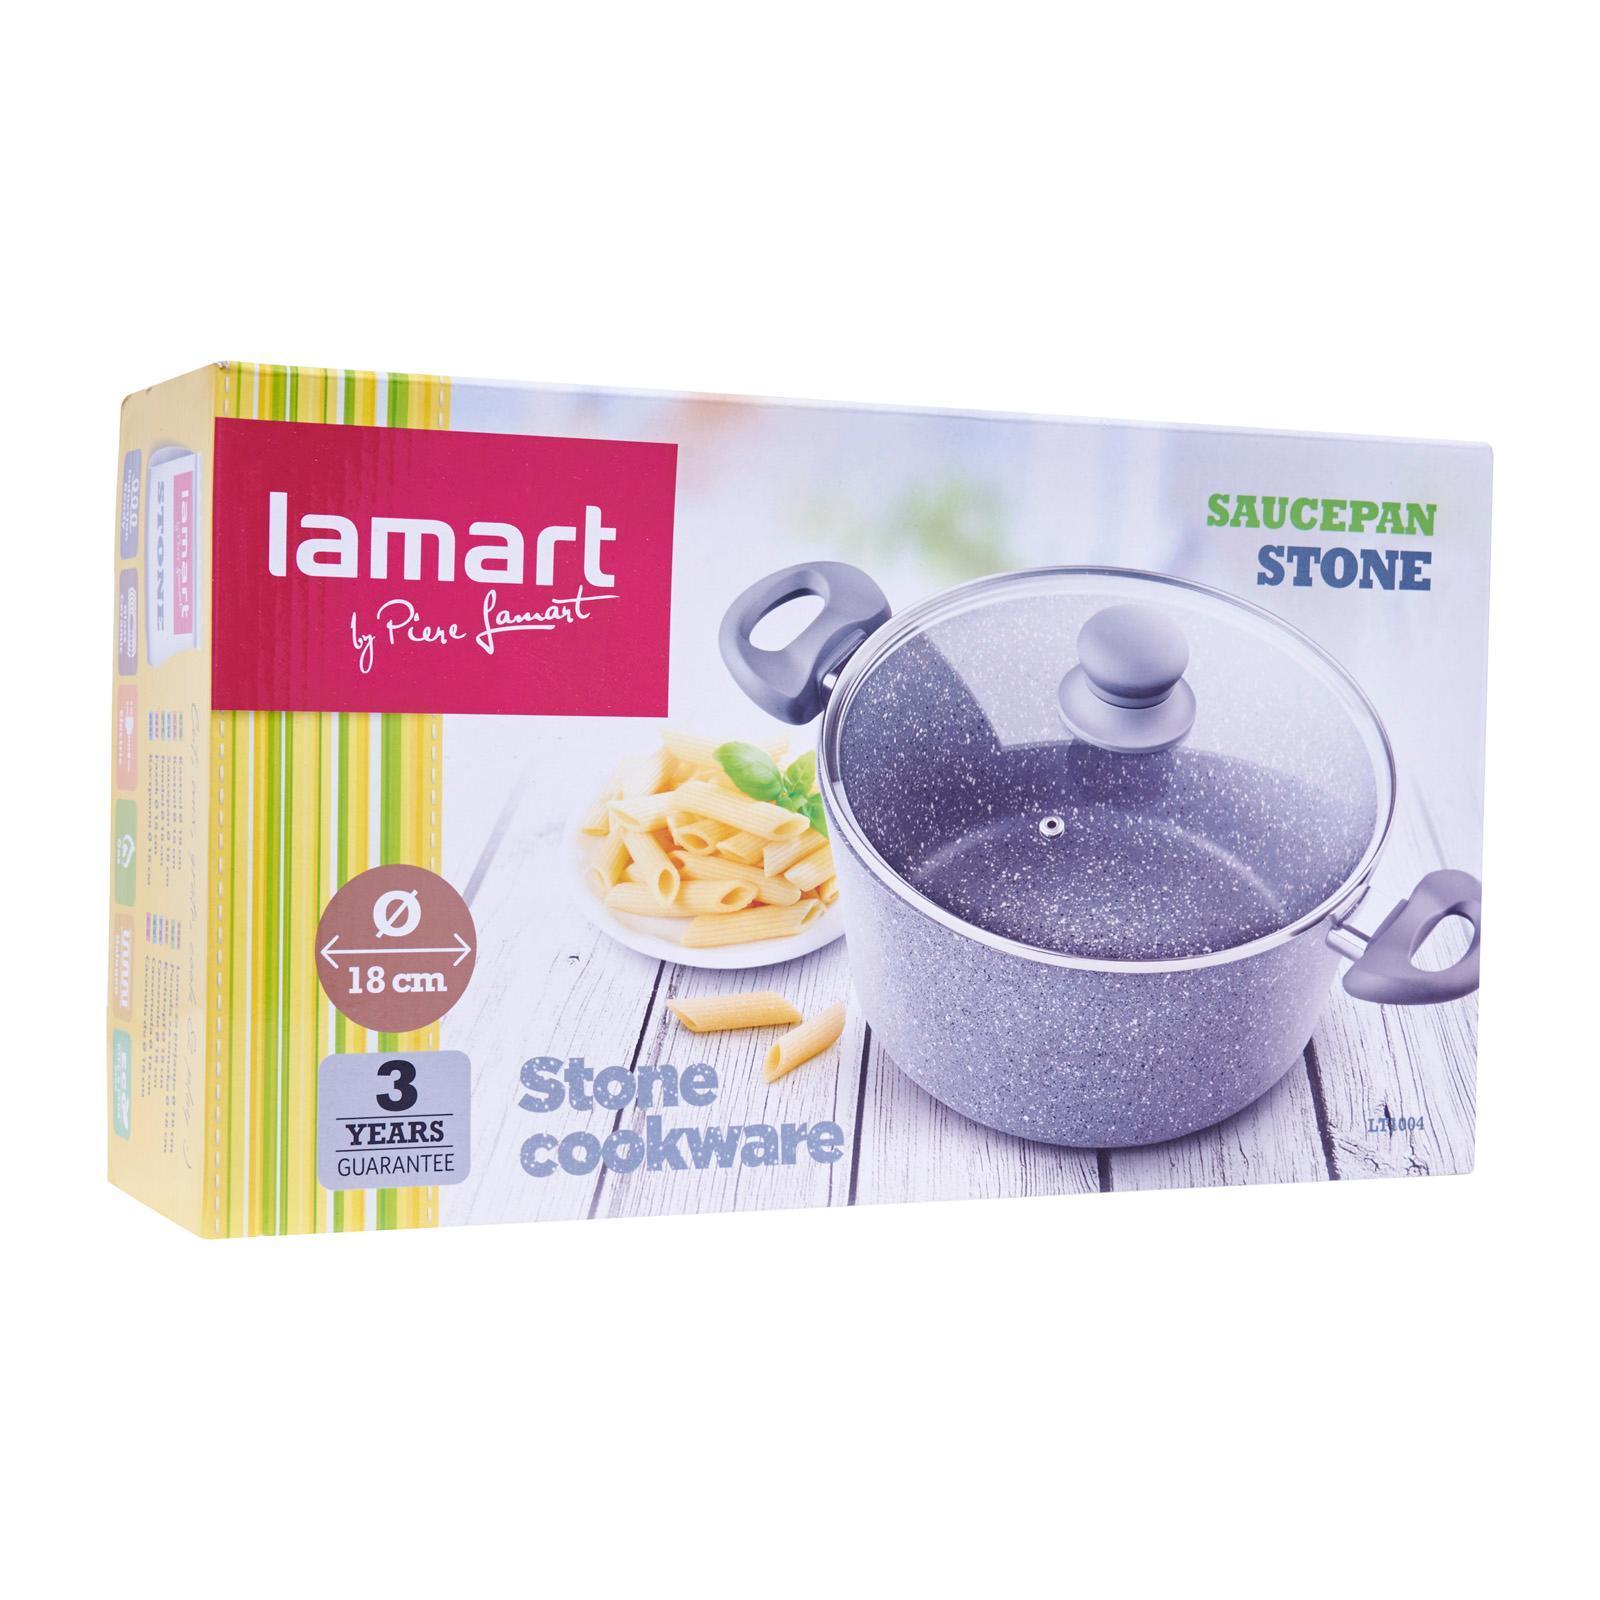 Lamart Induction Ready Marble Stone Saucepan/Casserole 18Cm 2.1L